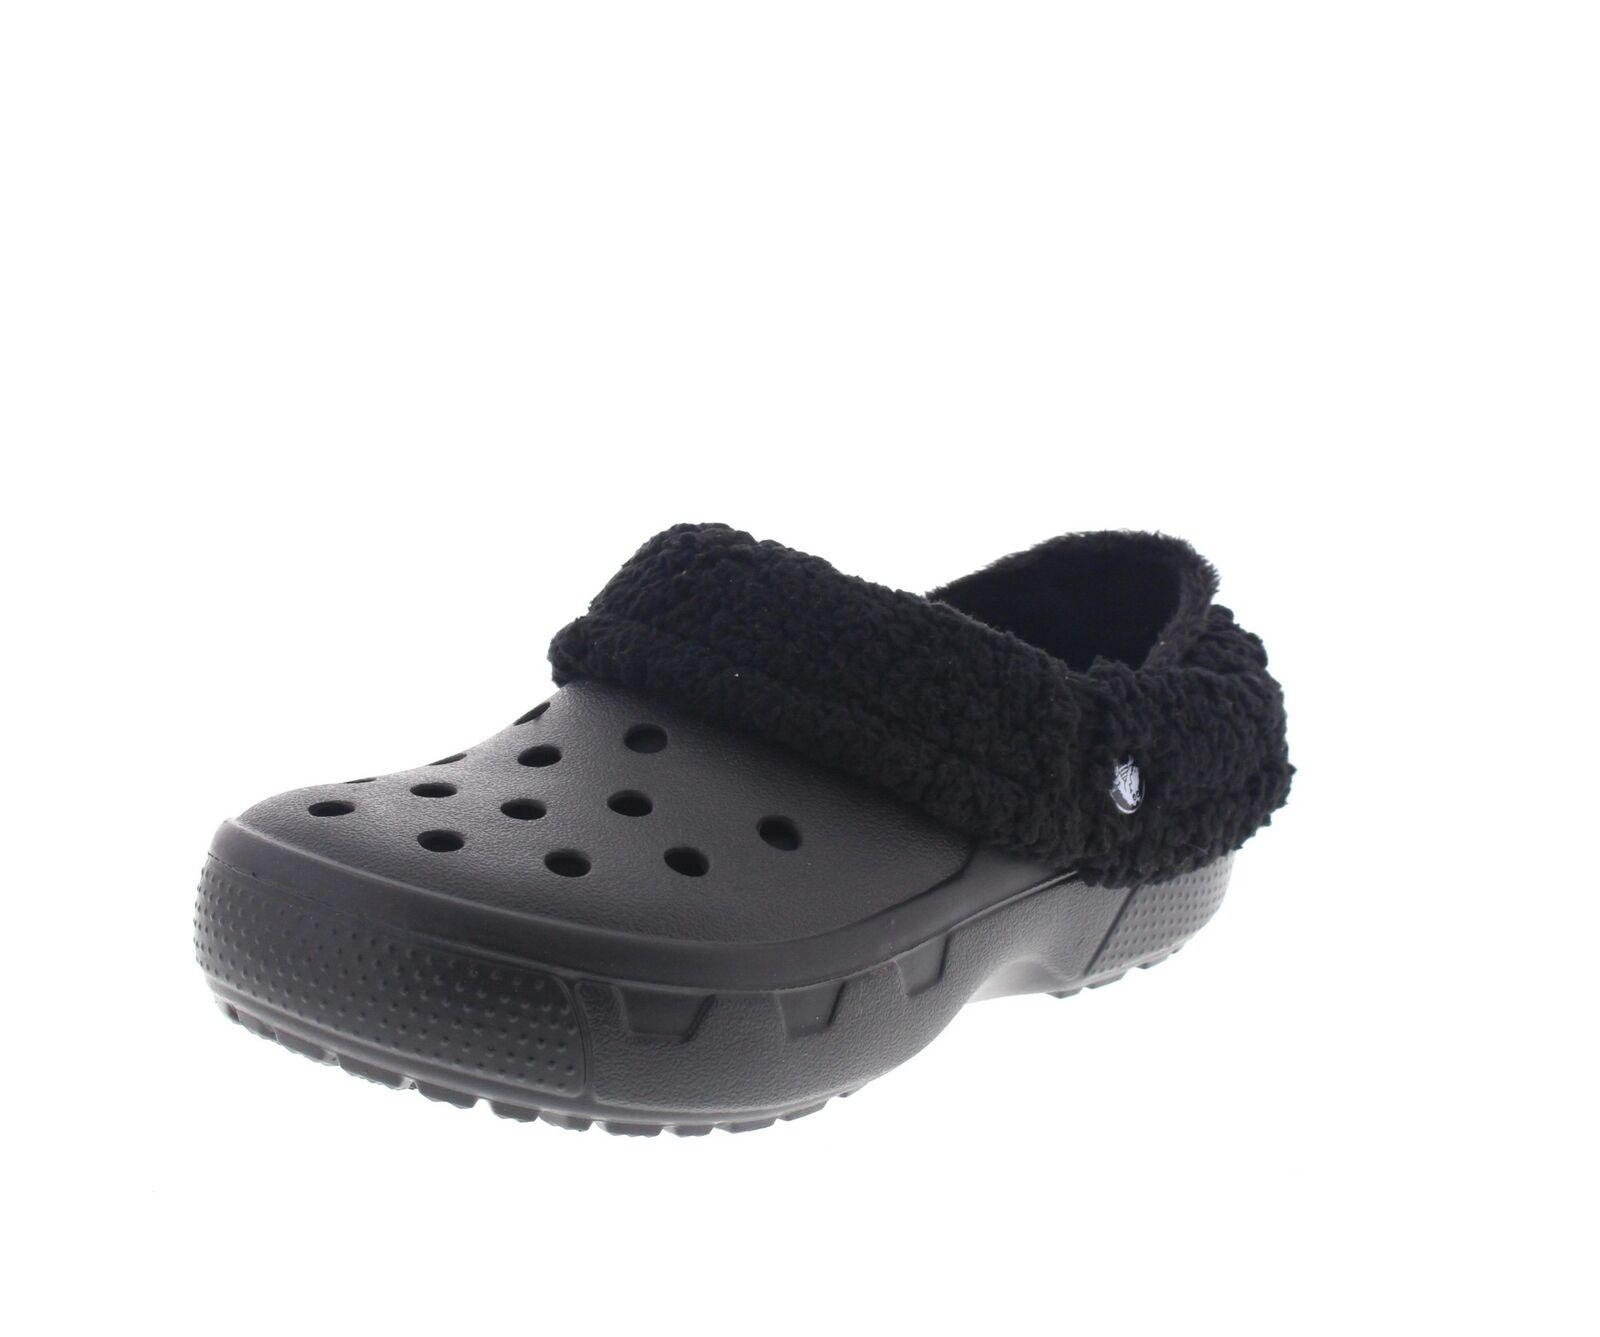 CROCS Schuhe - Gefütterte Clogs MAMMOTH EVO - schwarz